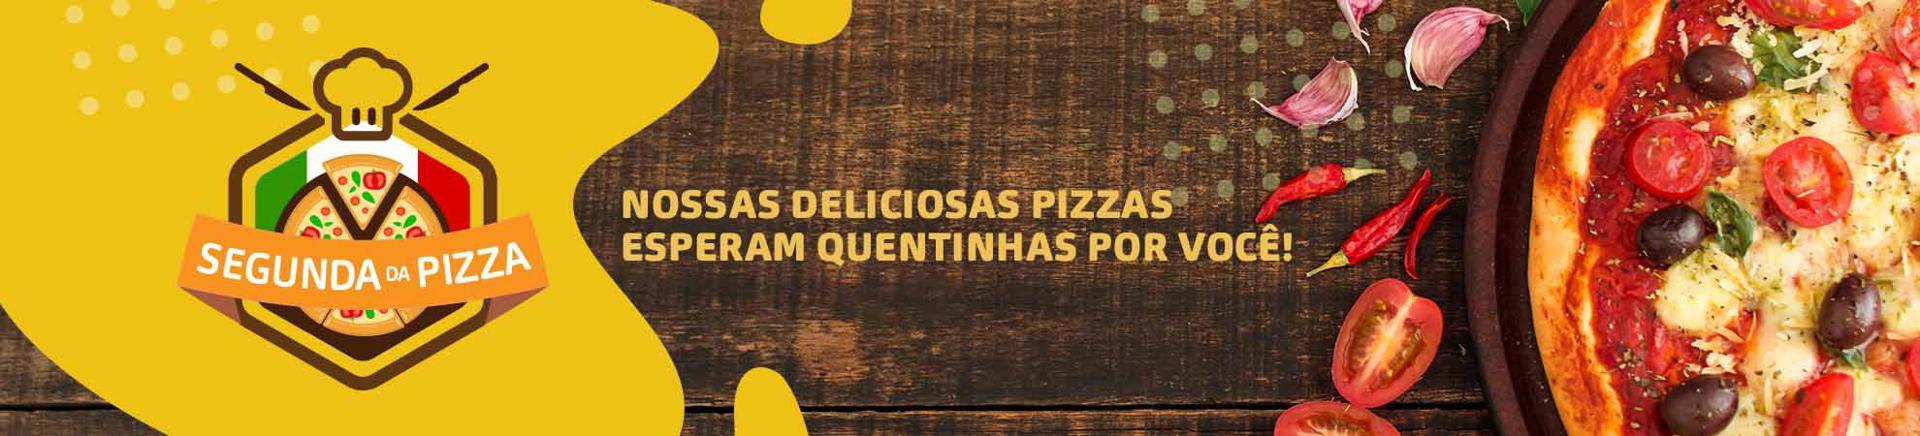 segunda pizza